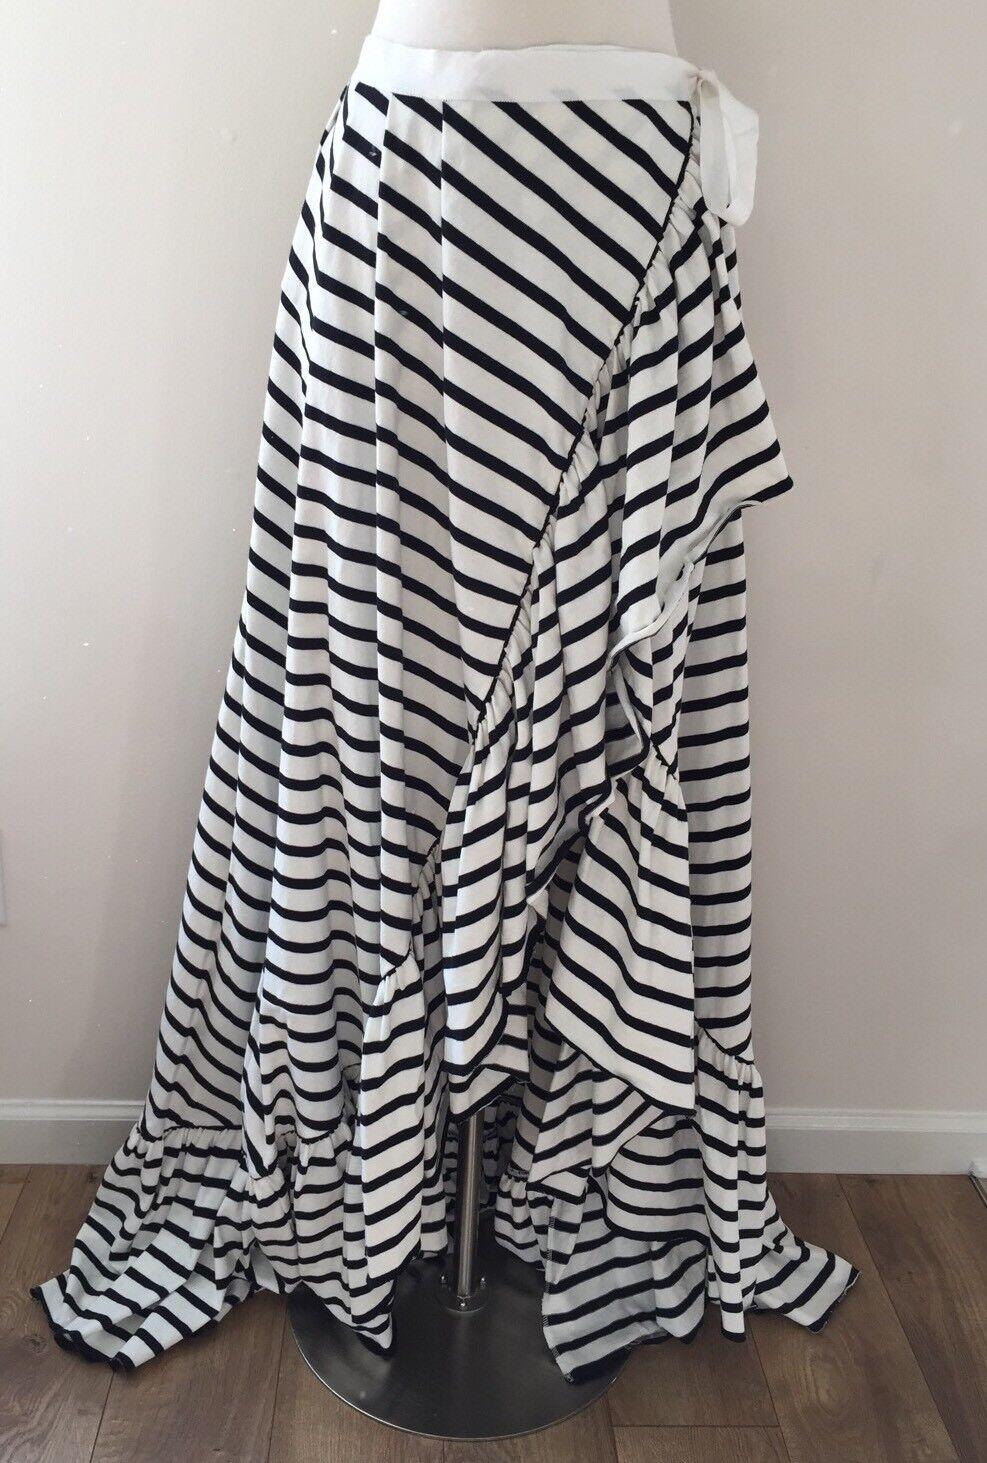 New Jcrew Striped Ruffle High Low Wrap Skirt Tie Front Dramatic Ruffle XS S